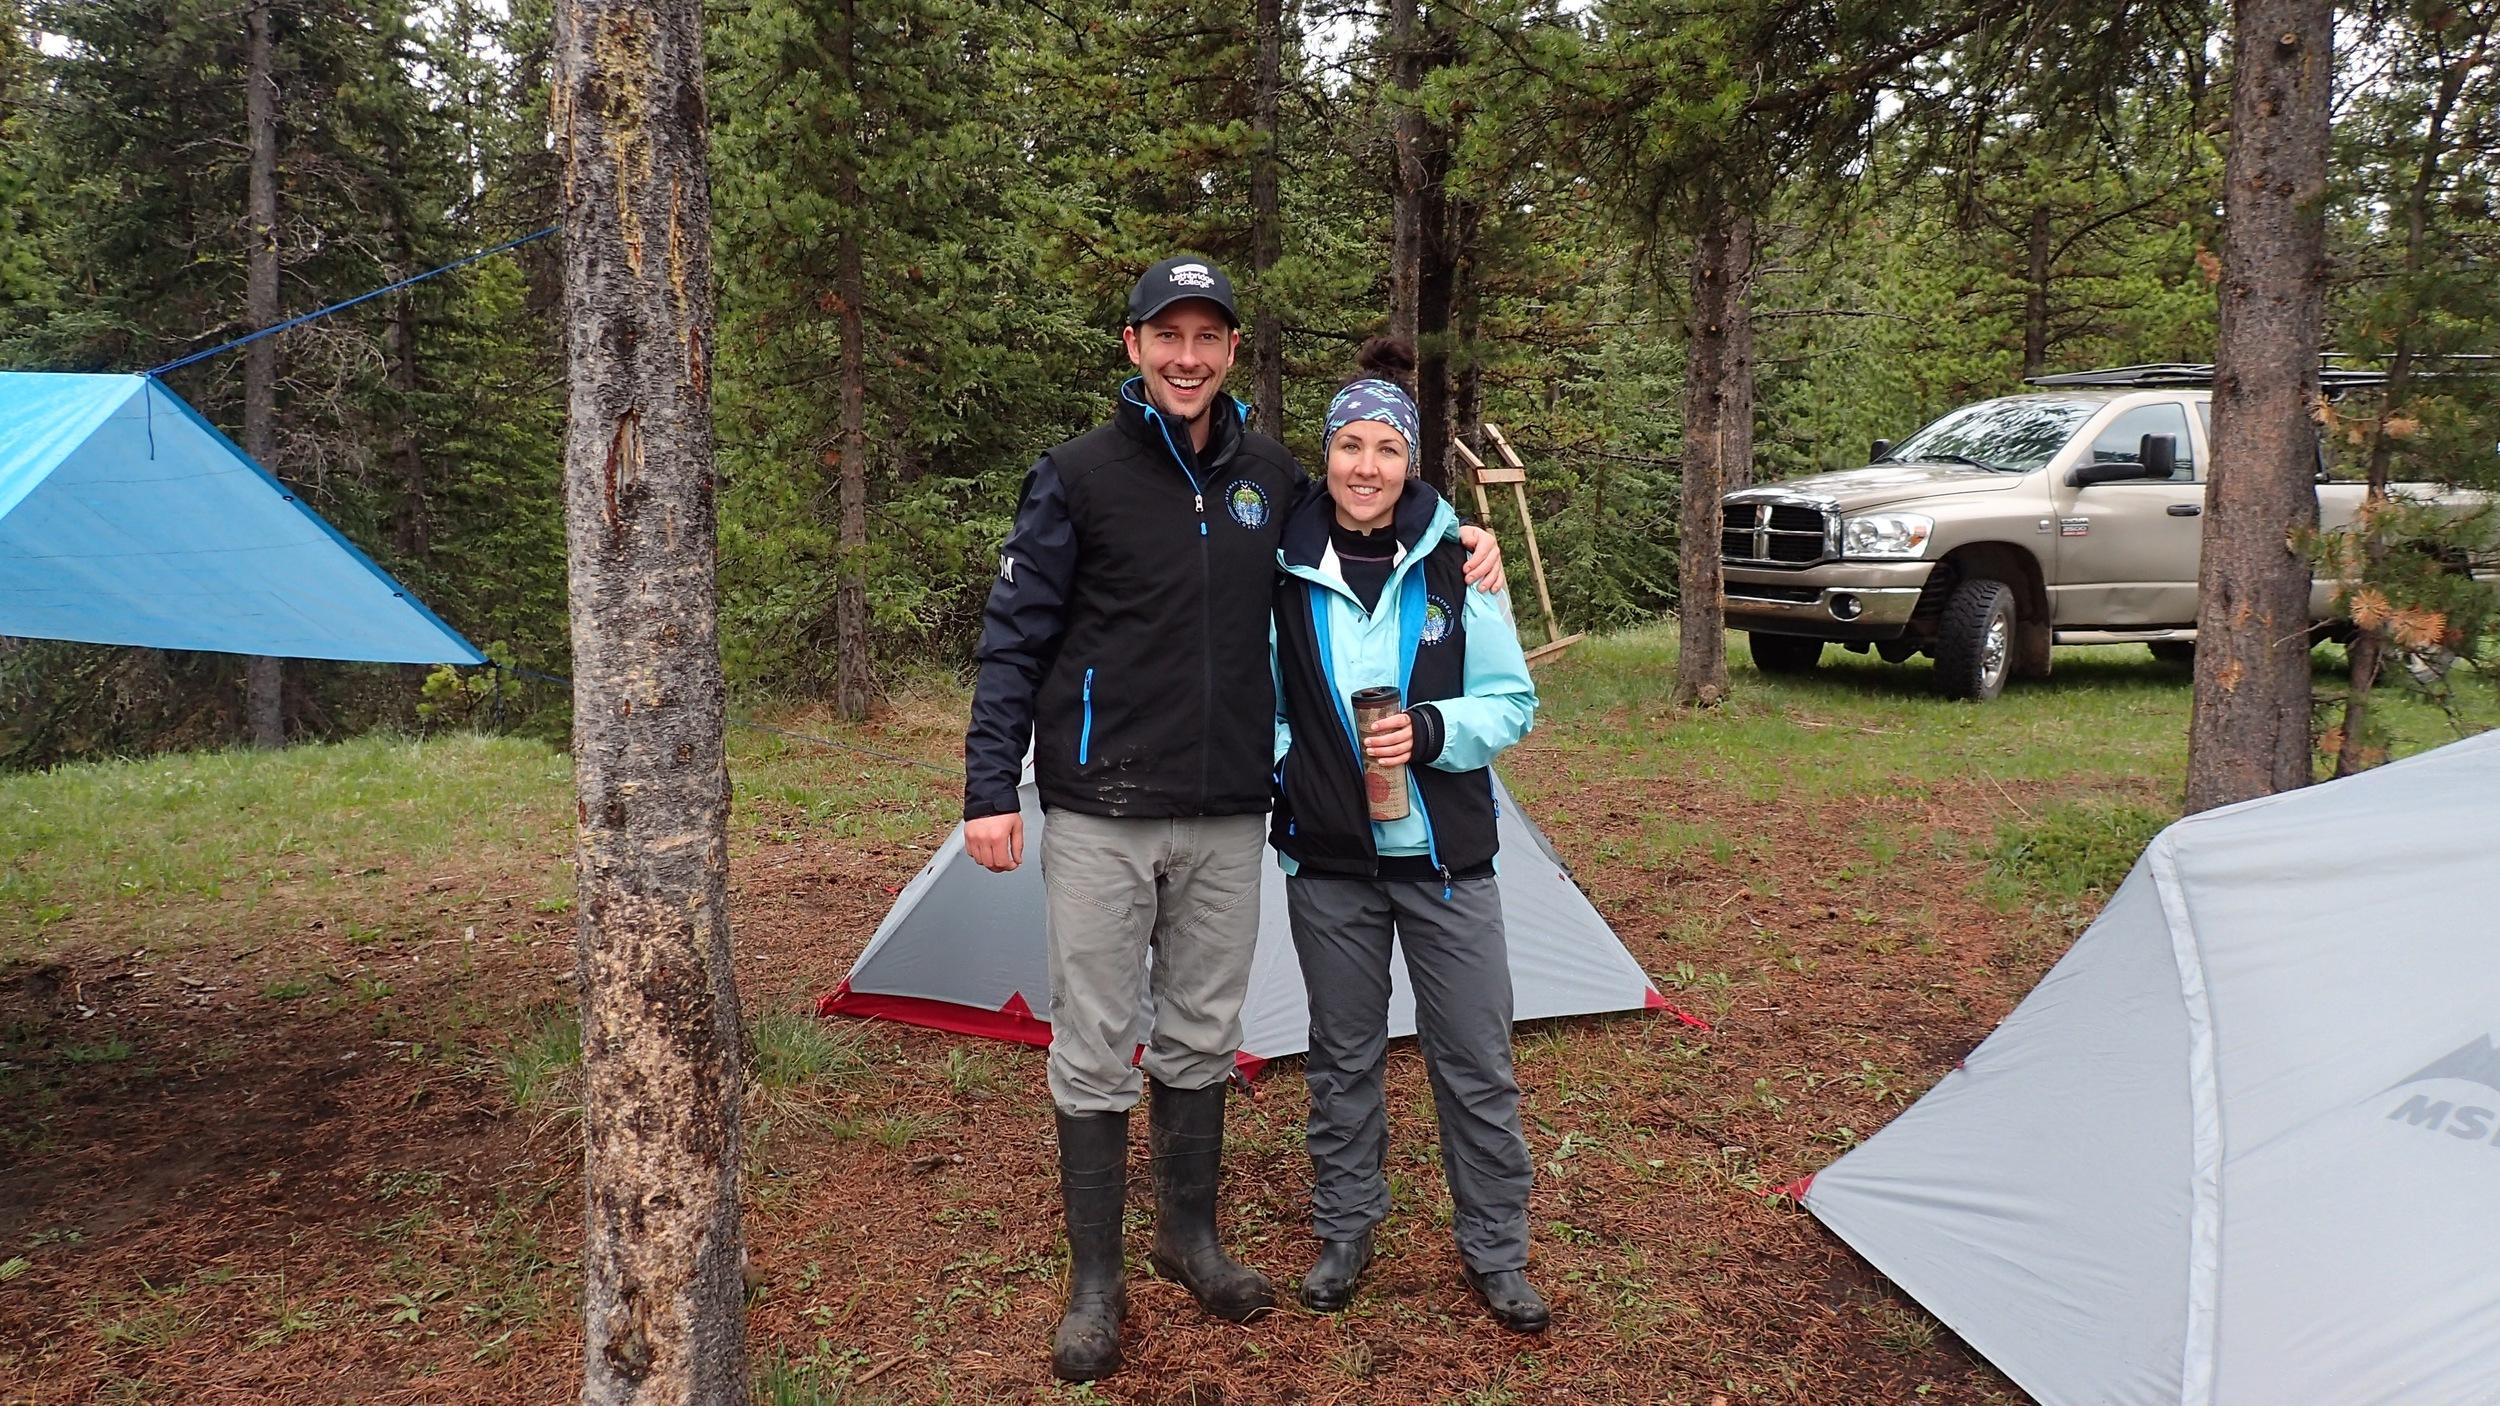 Ryan and Nicola setting up camp in the rain